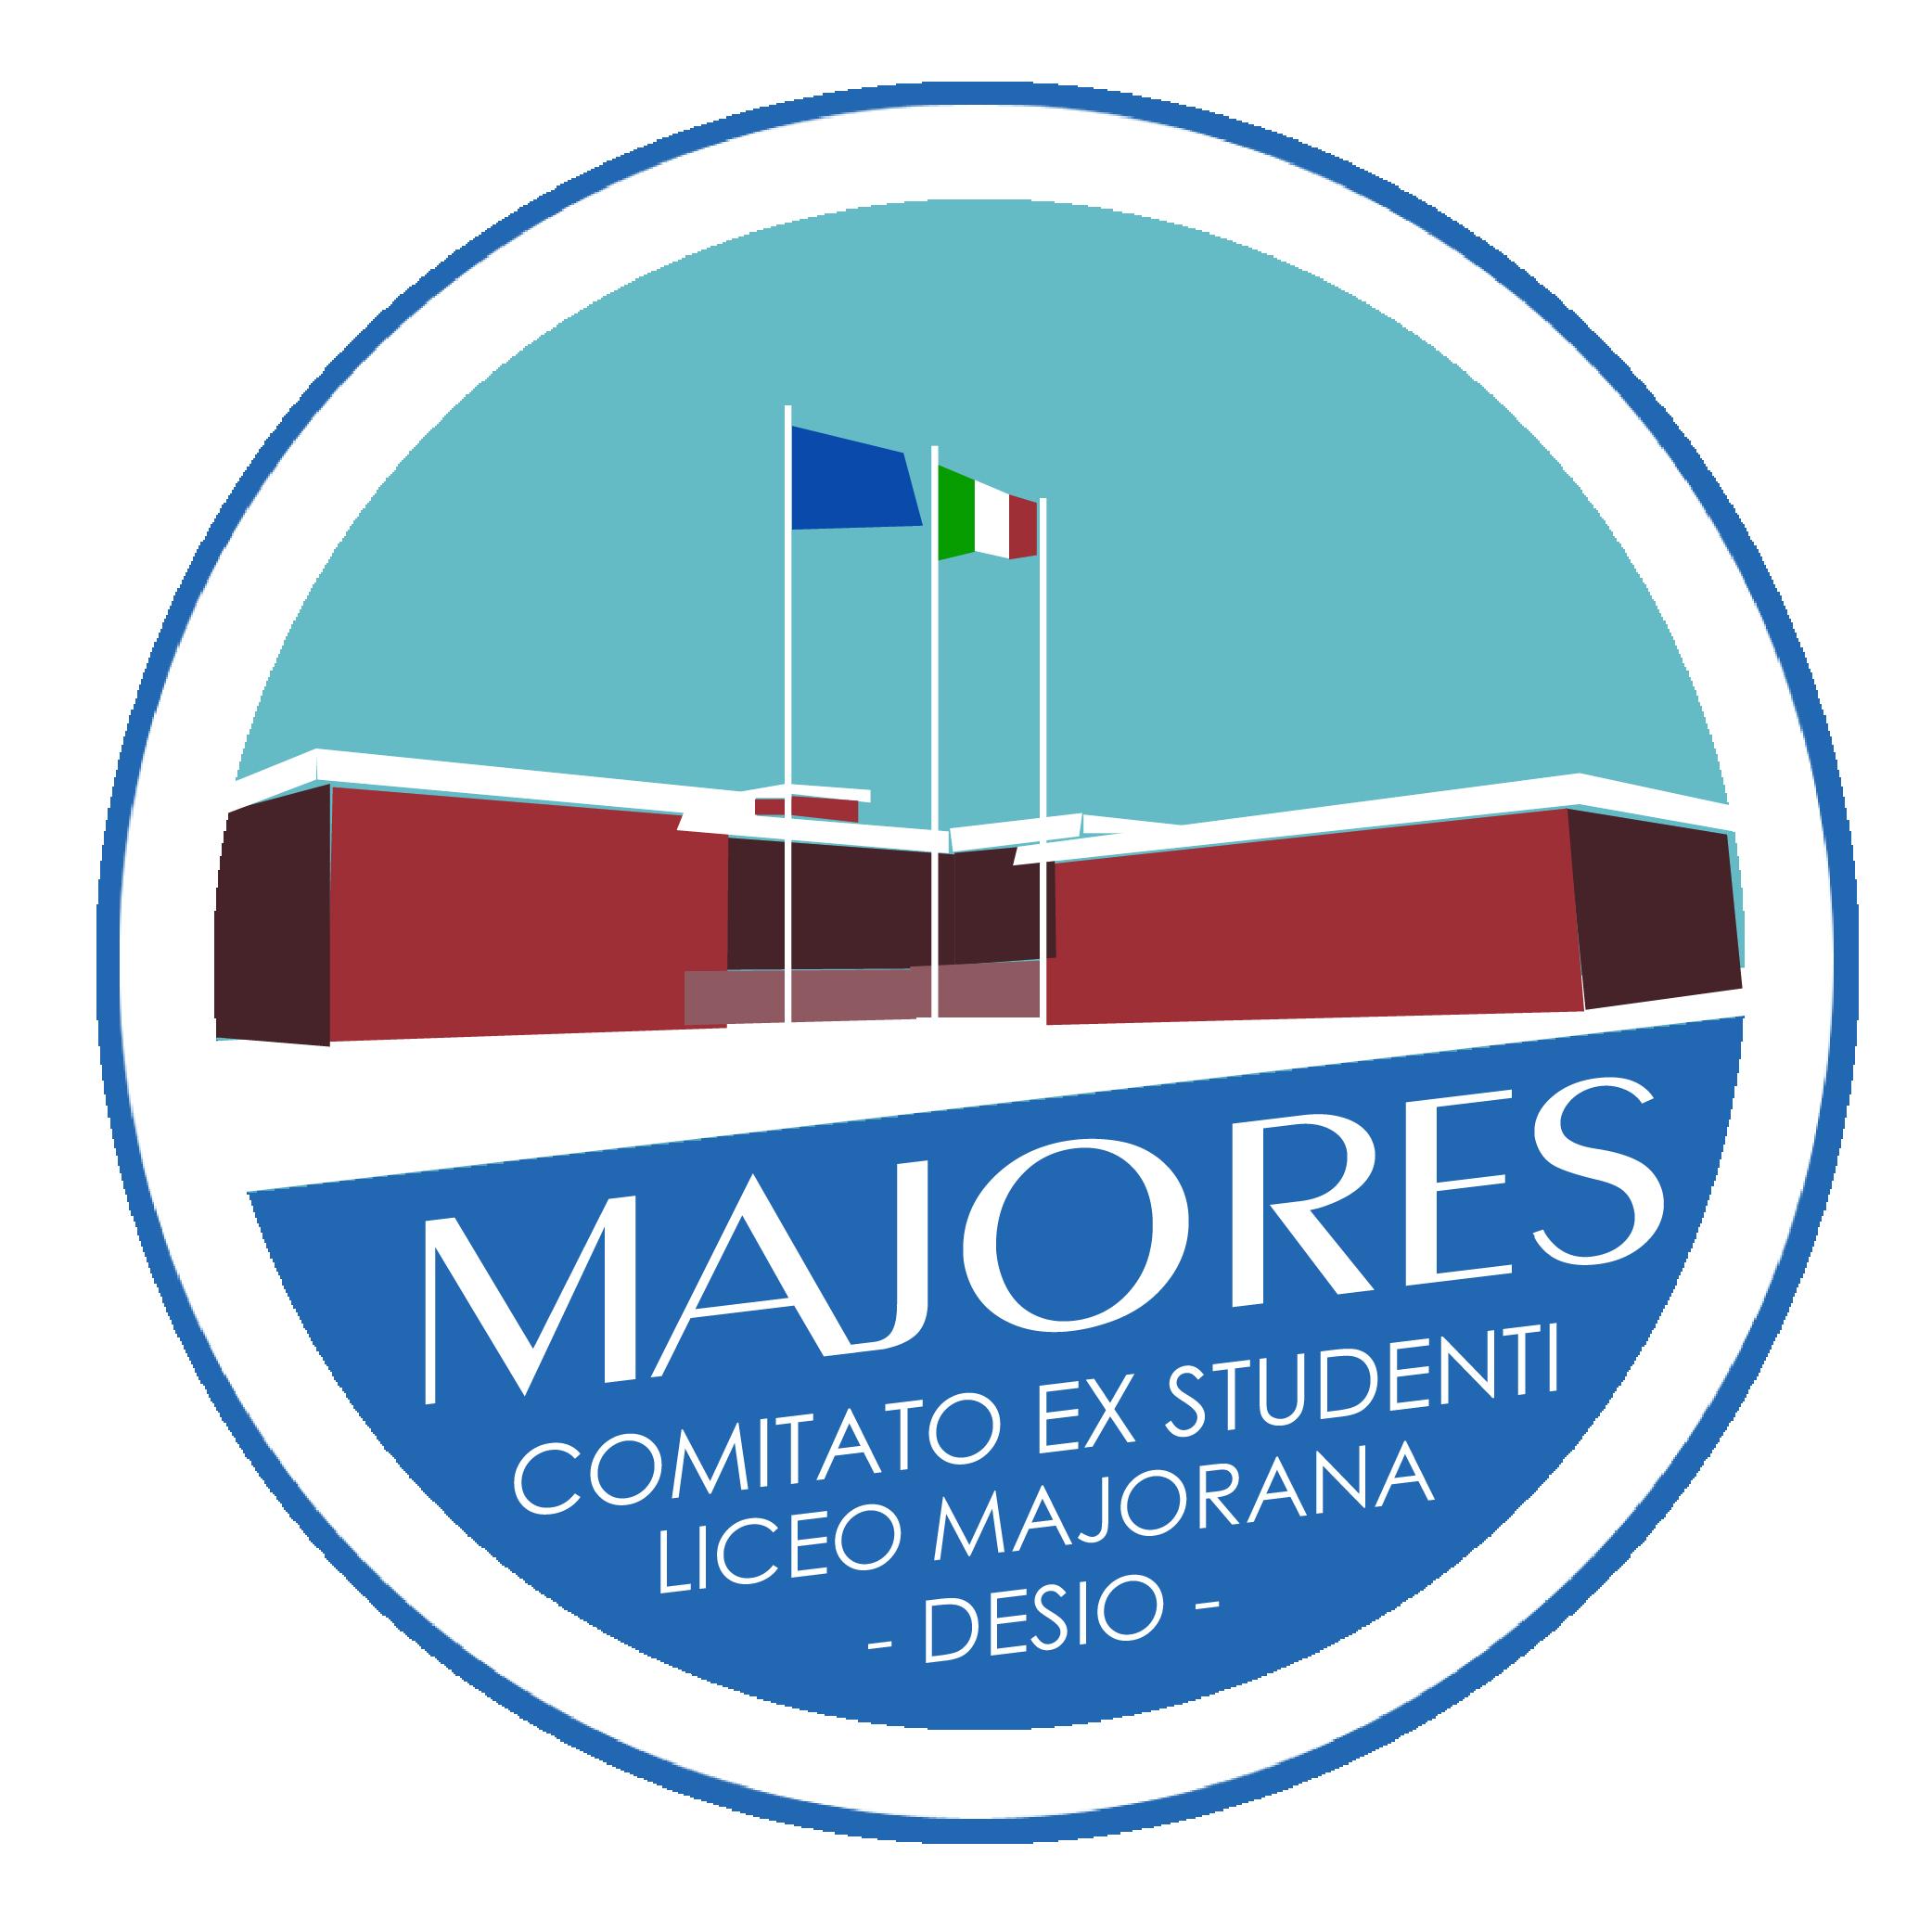 Majores